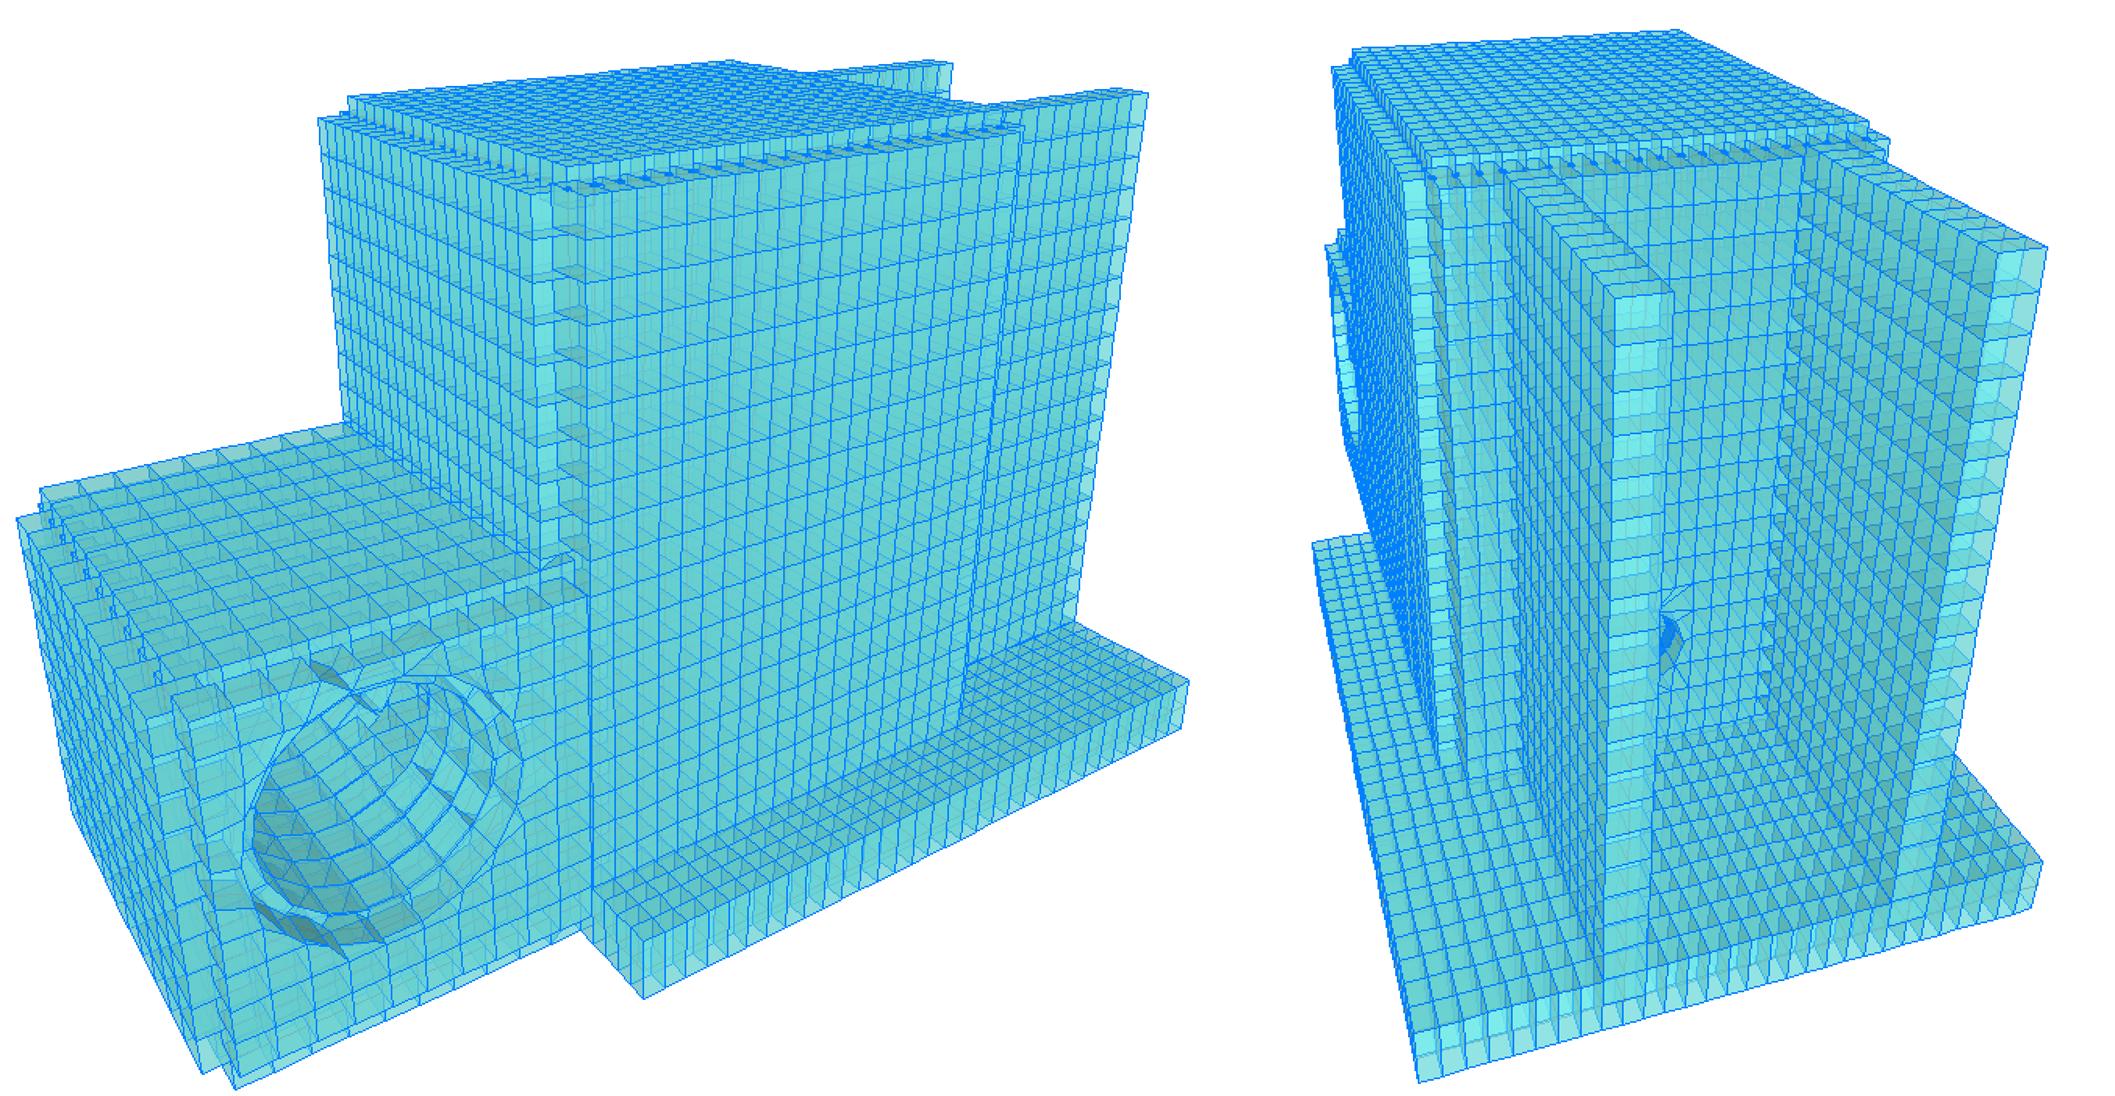 4. Tuberia Tibitoc-Usaquen,  tramo inestable estructura caja de salida en 24 pulgadas